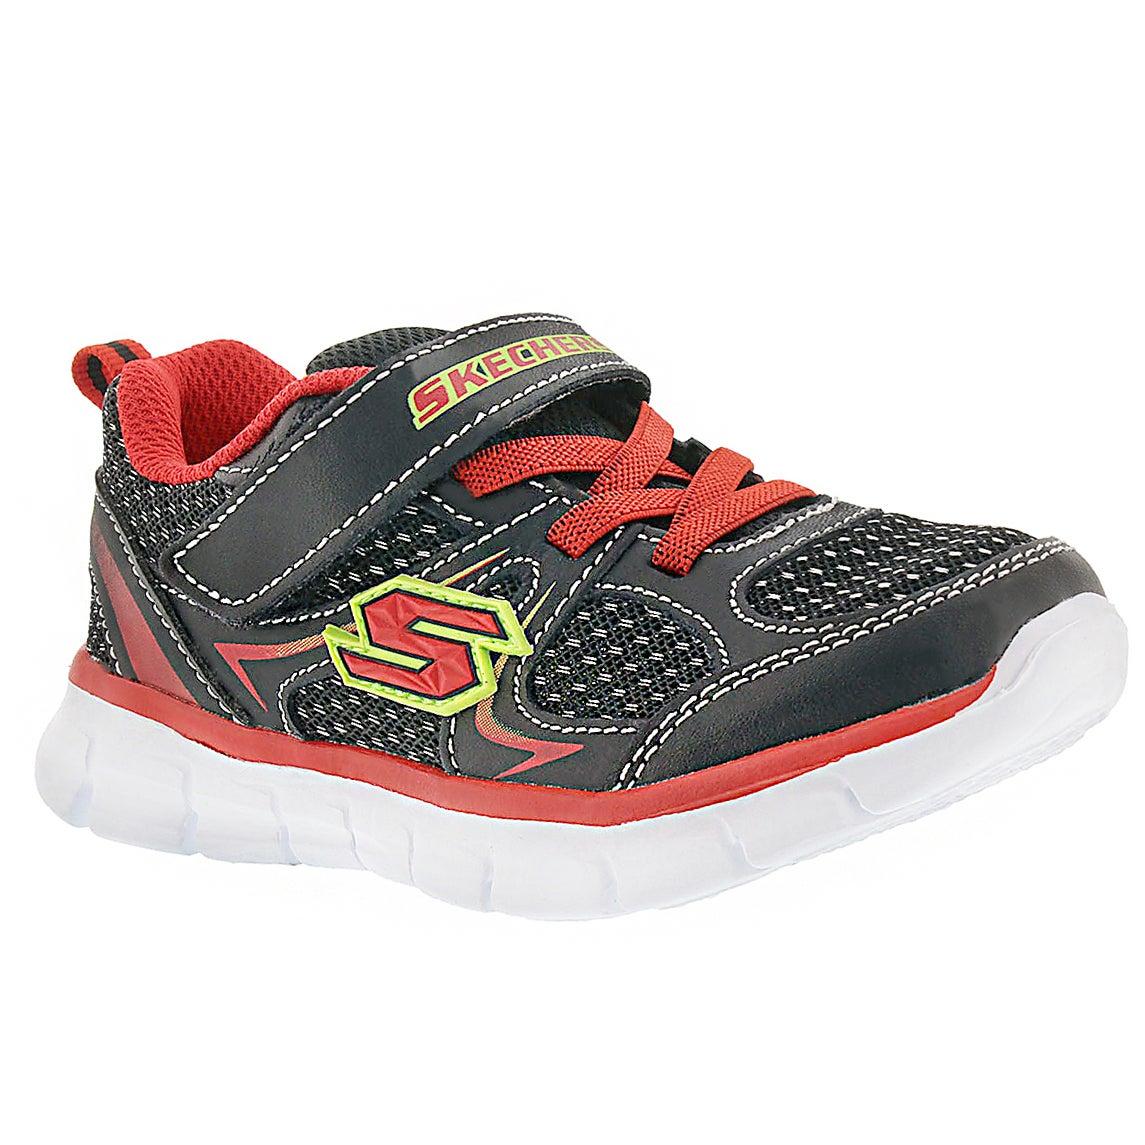 Inf Mini Dash black/red sneaker